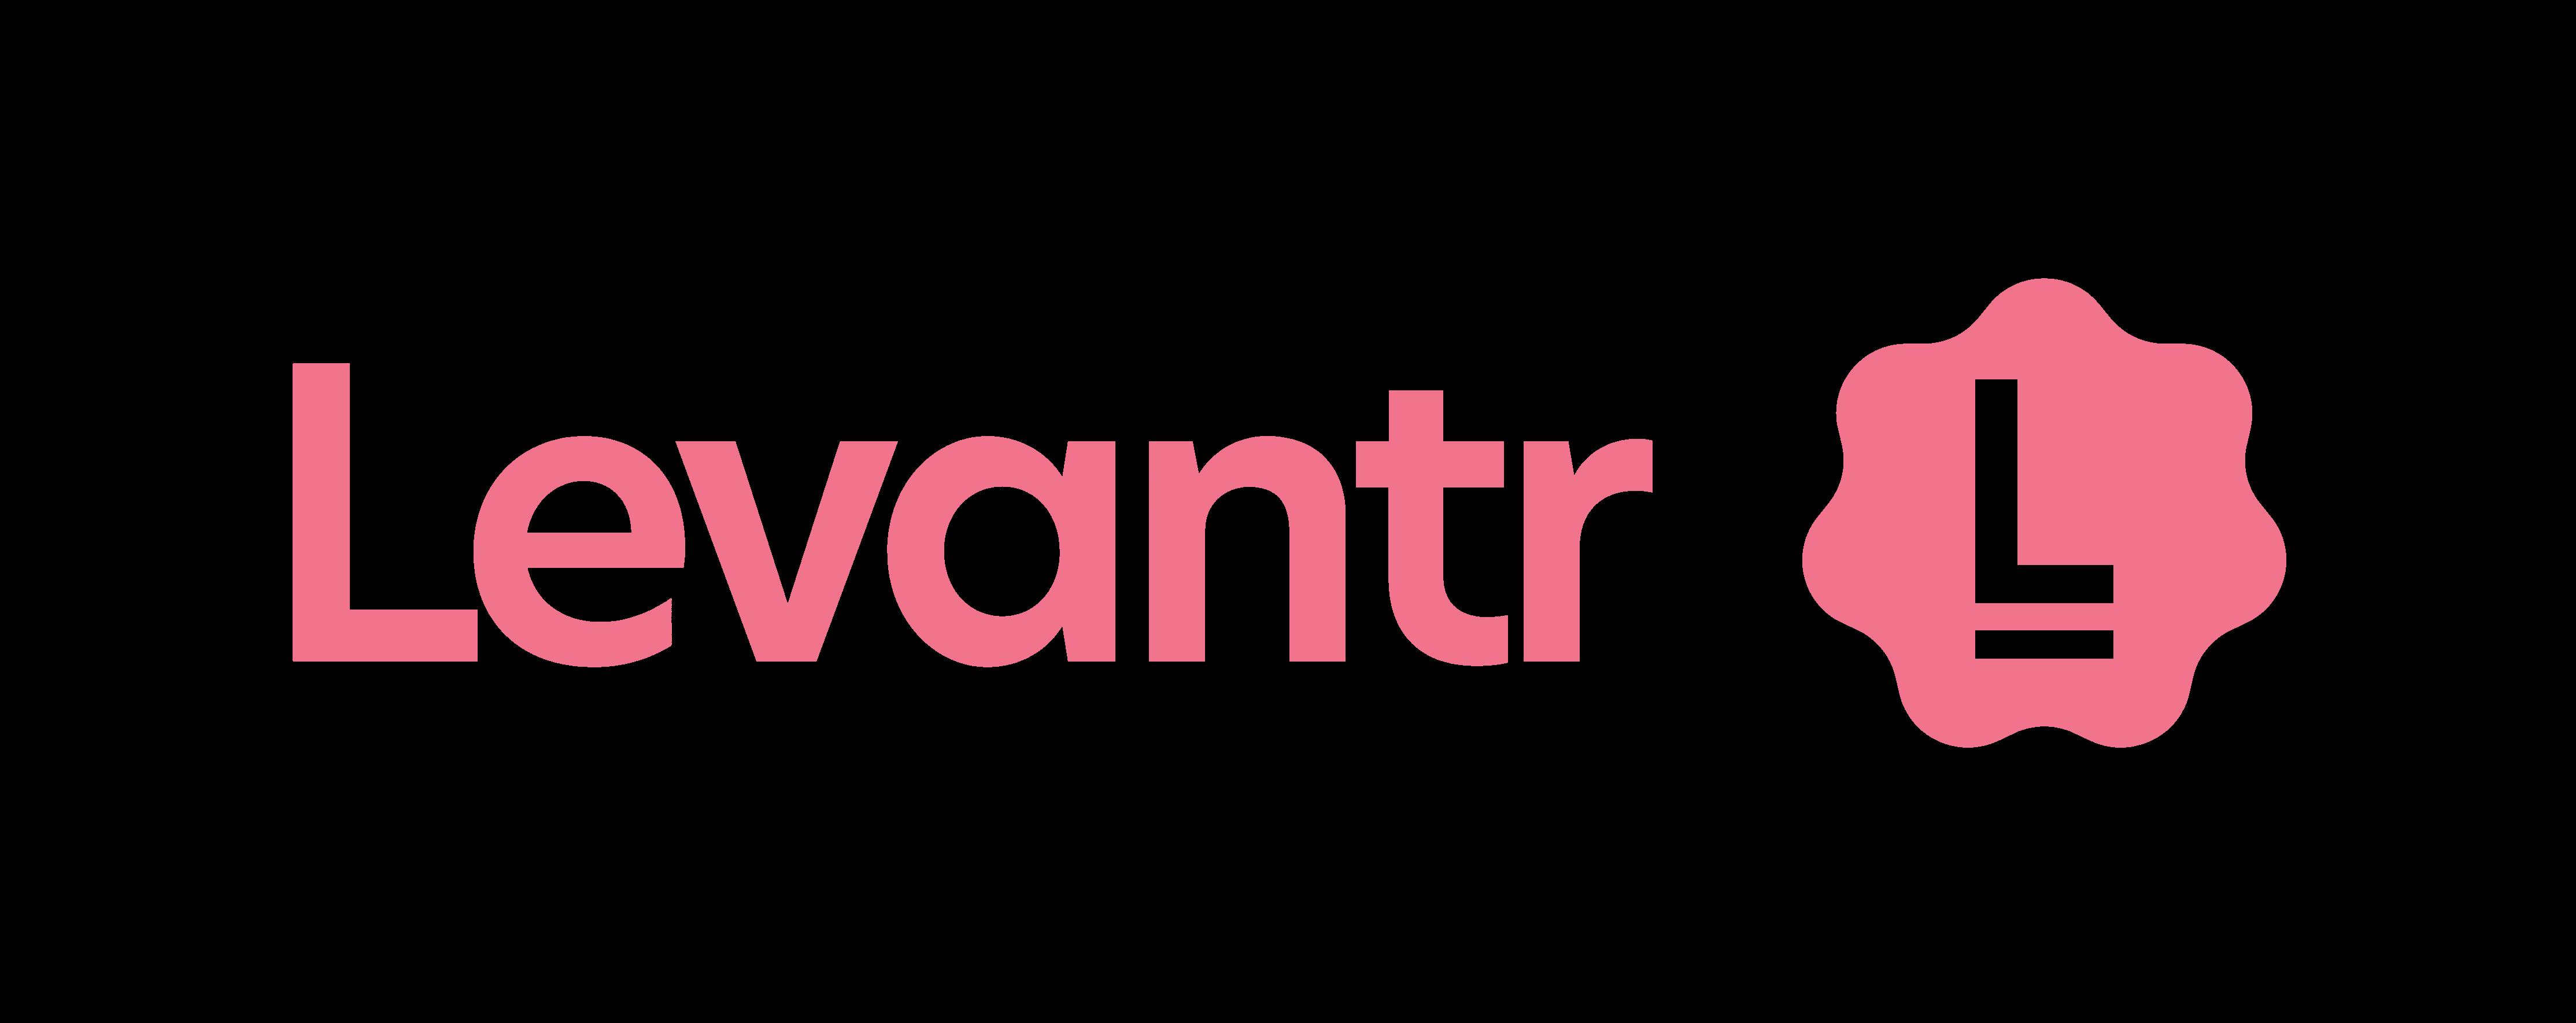 Liberating travel planning app Levantr strikes key partnerships with international hotels